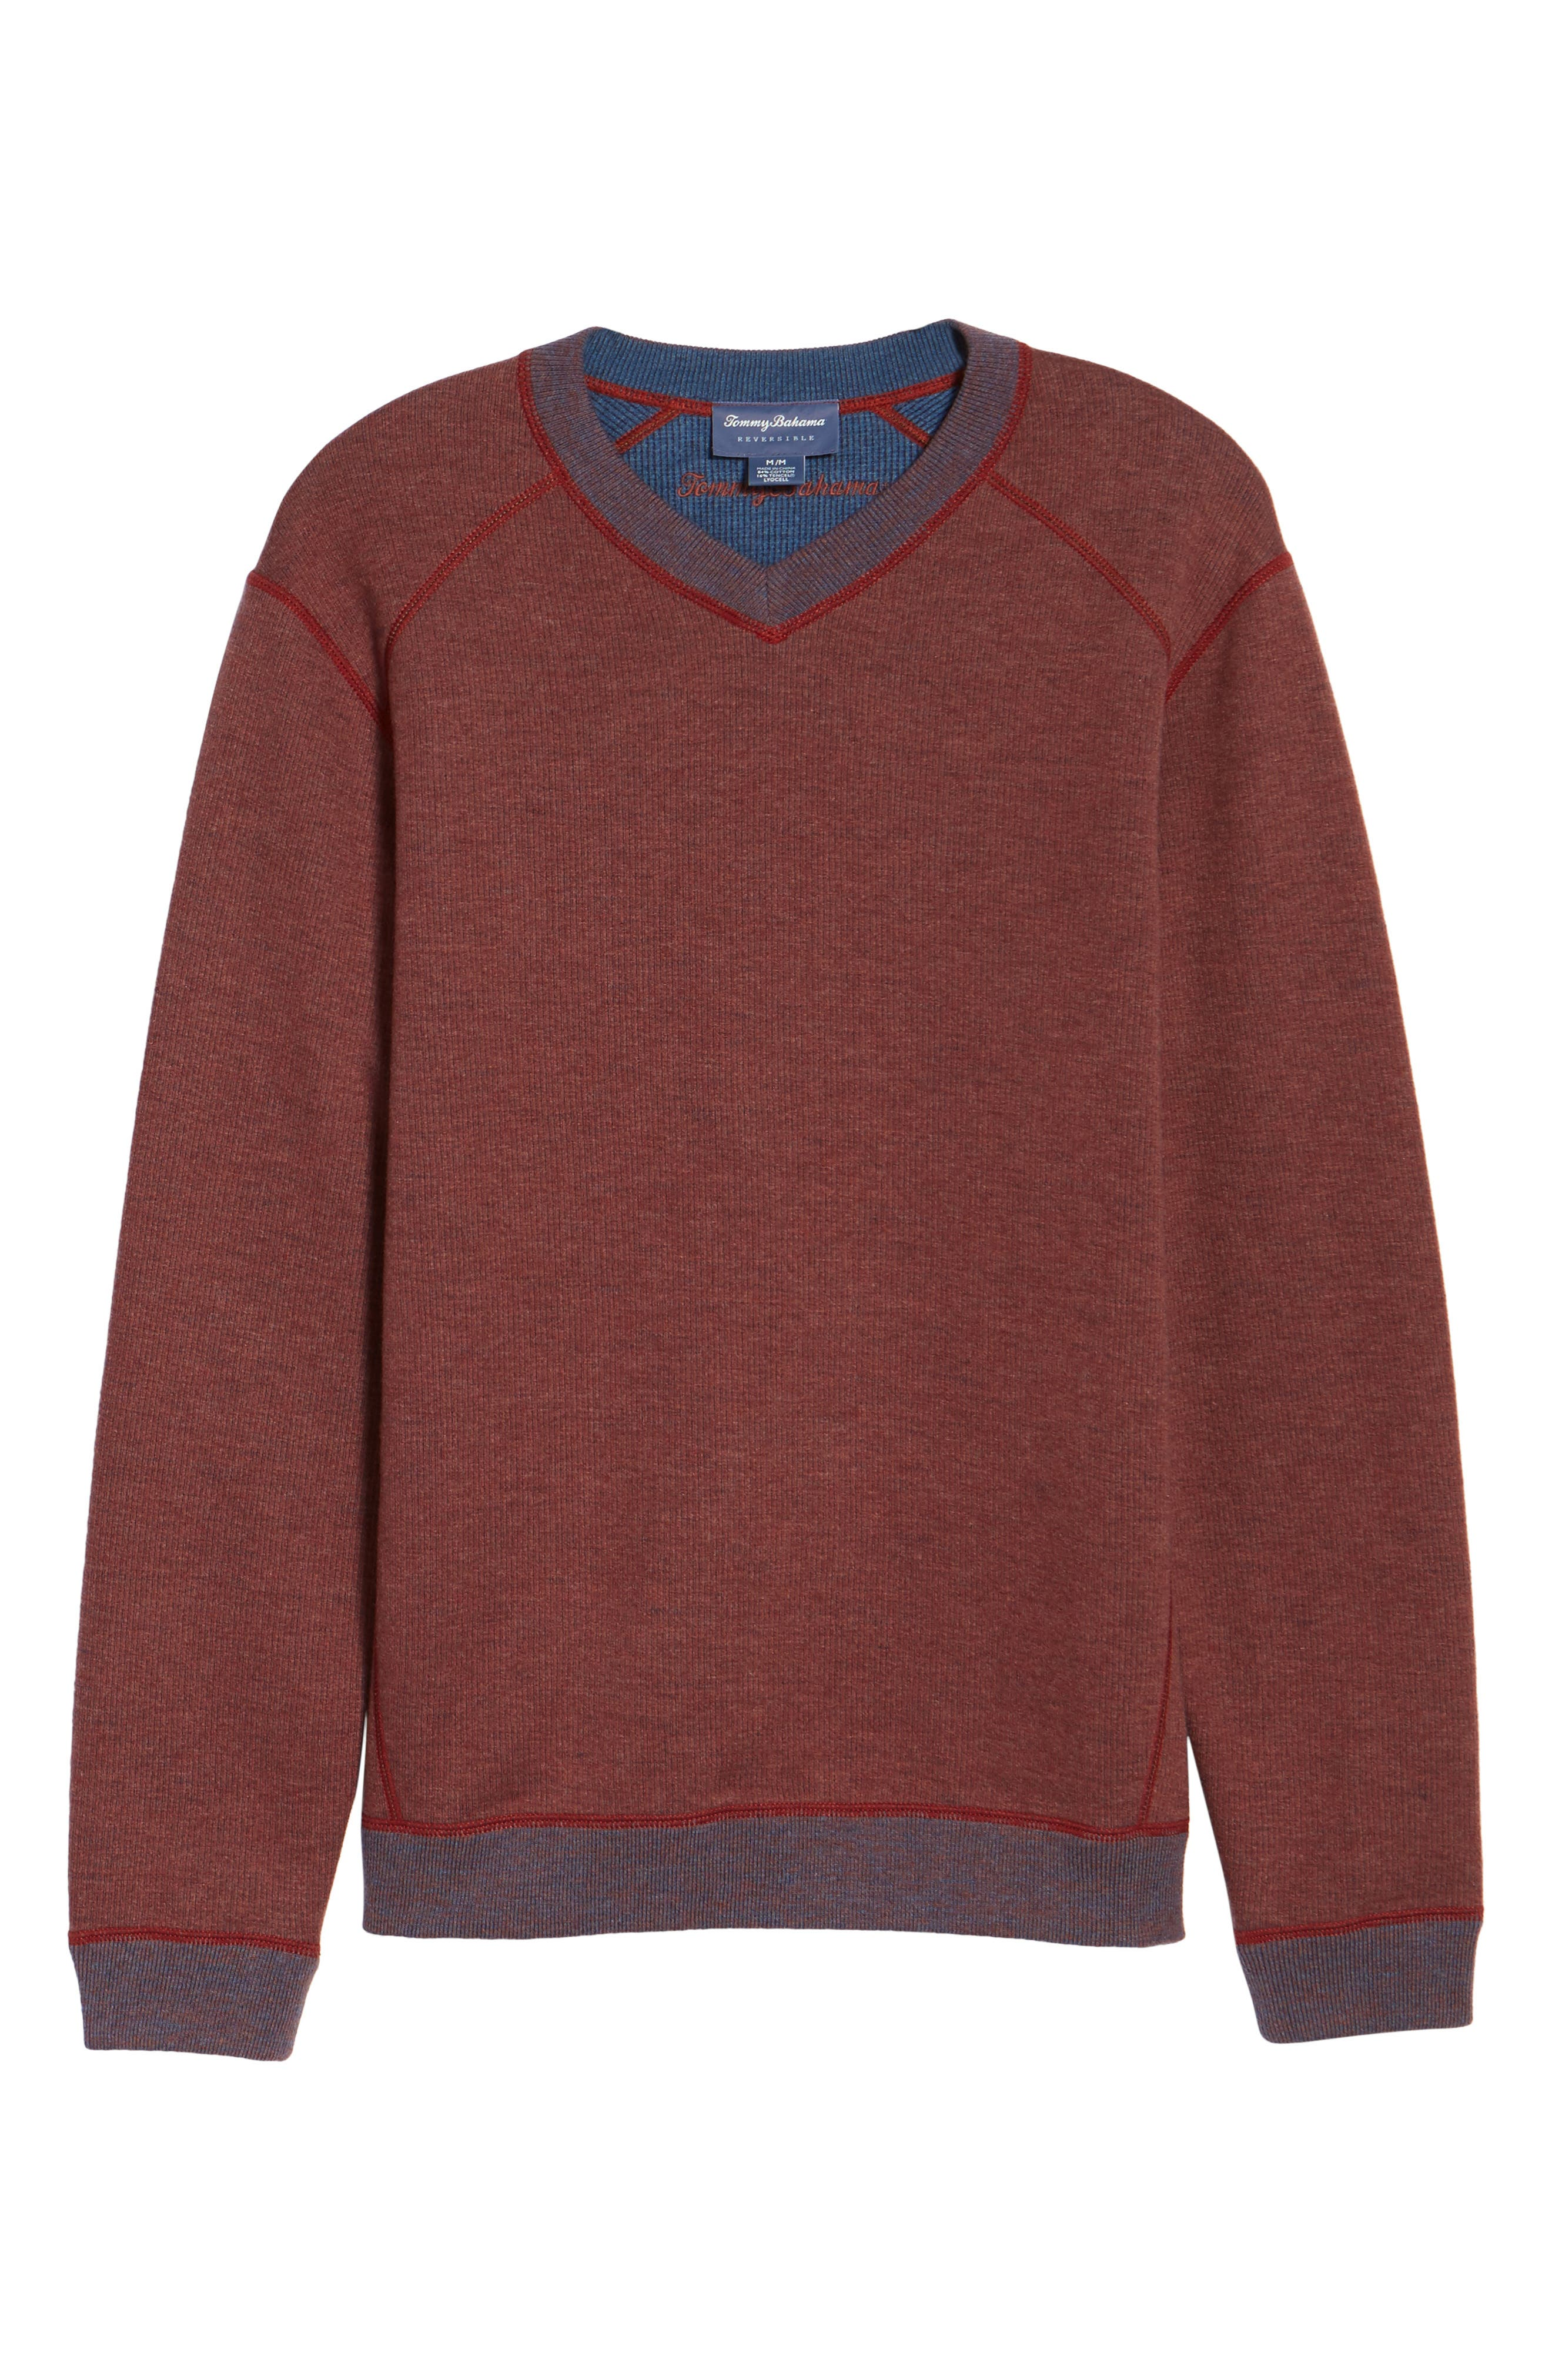 Flipside Pro Reversible Sweatshirt,                             Alternate thumbnail 6, color,                             Pompeya Heather